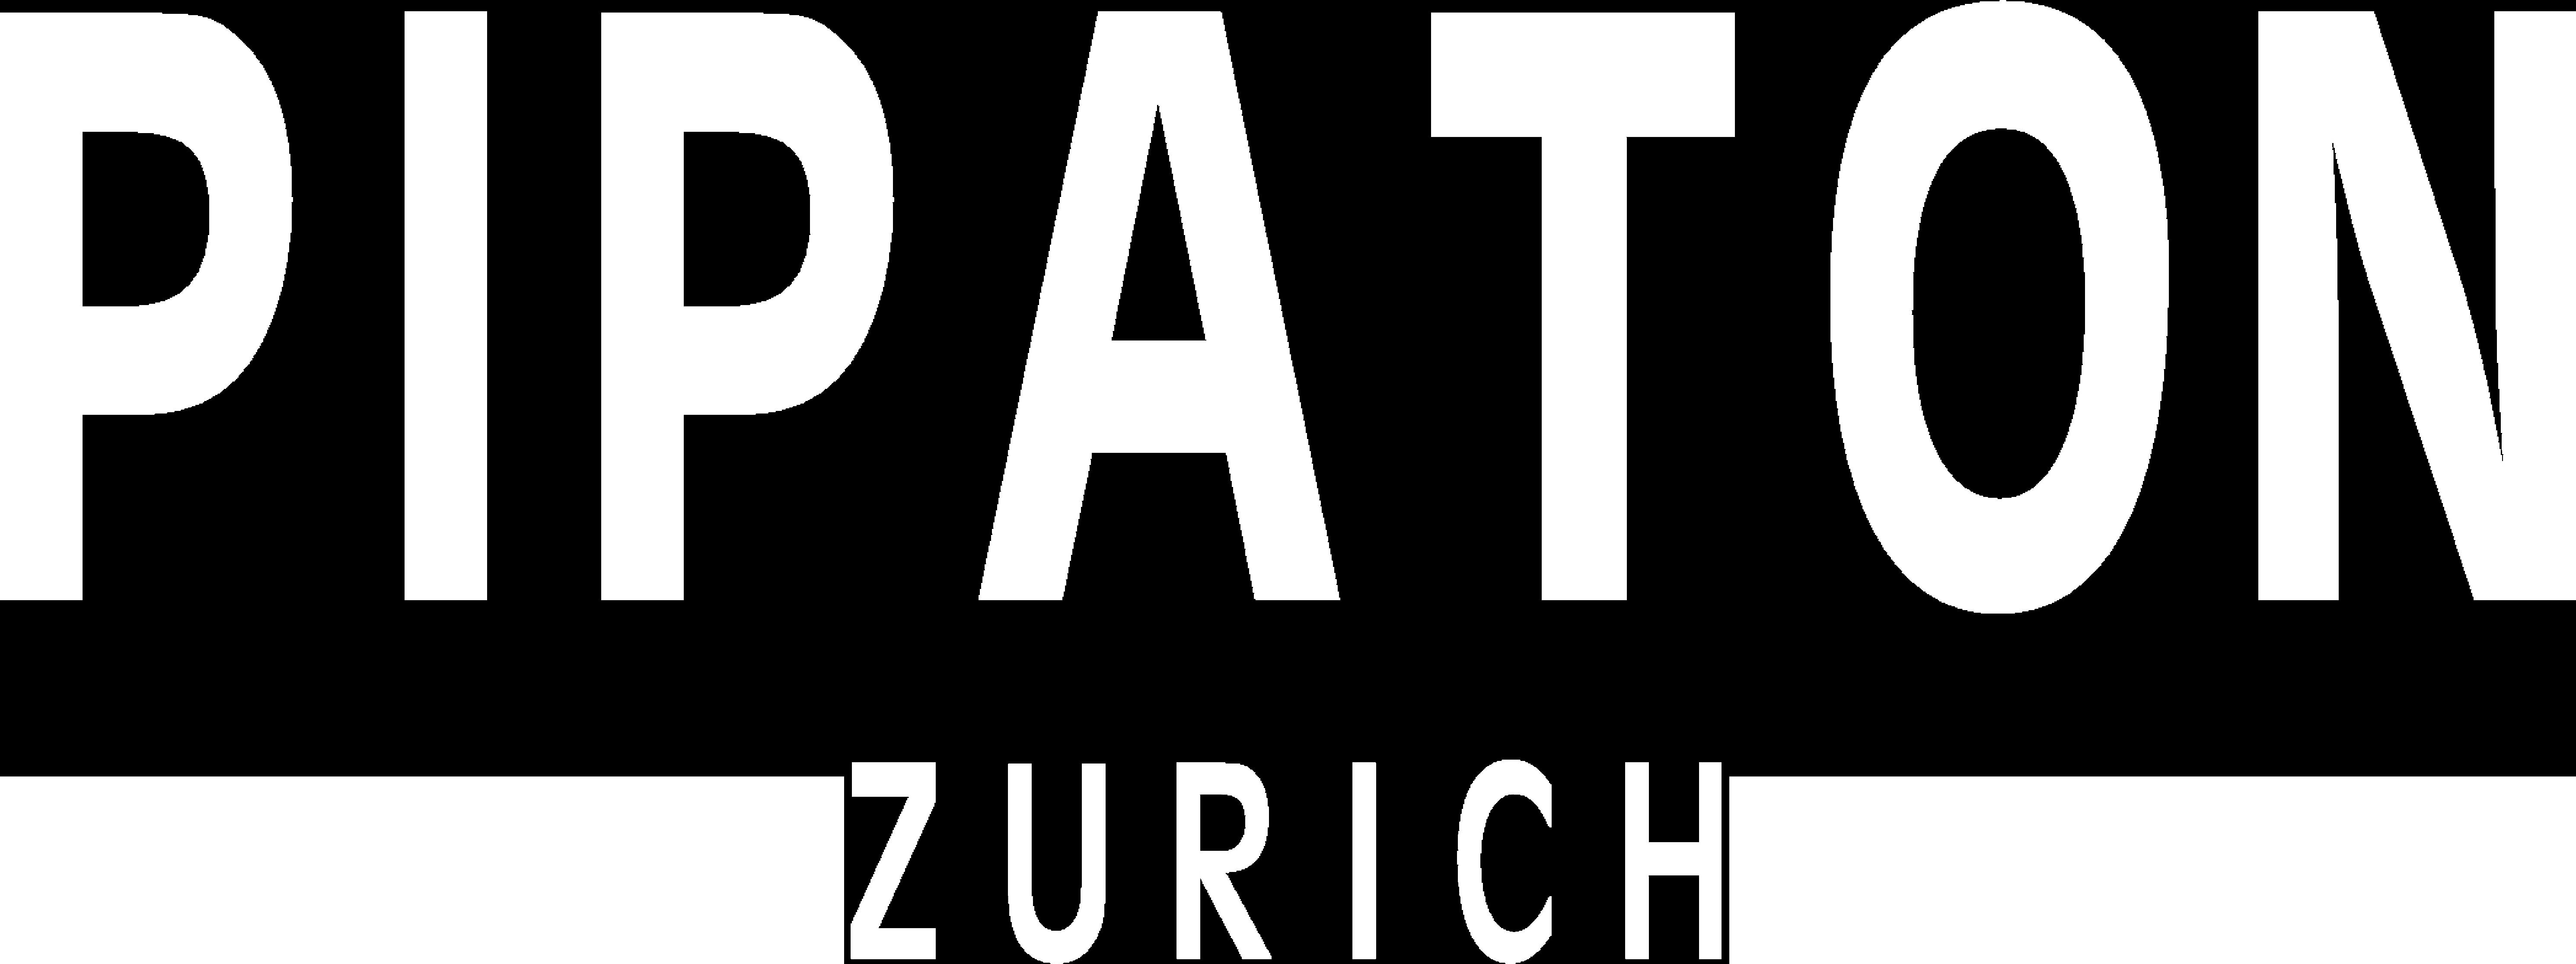 Pipaton Logo